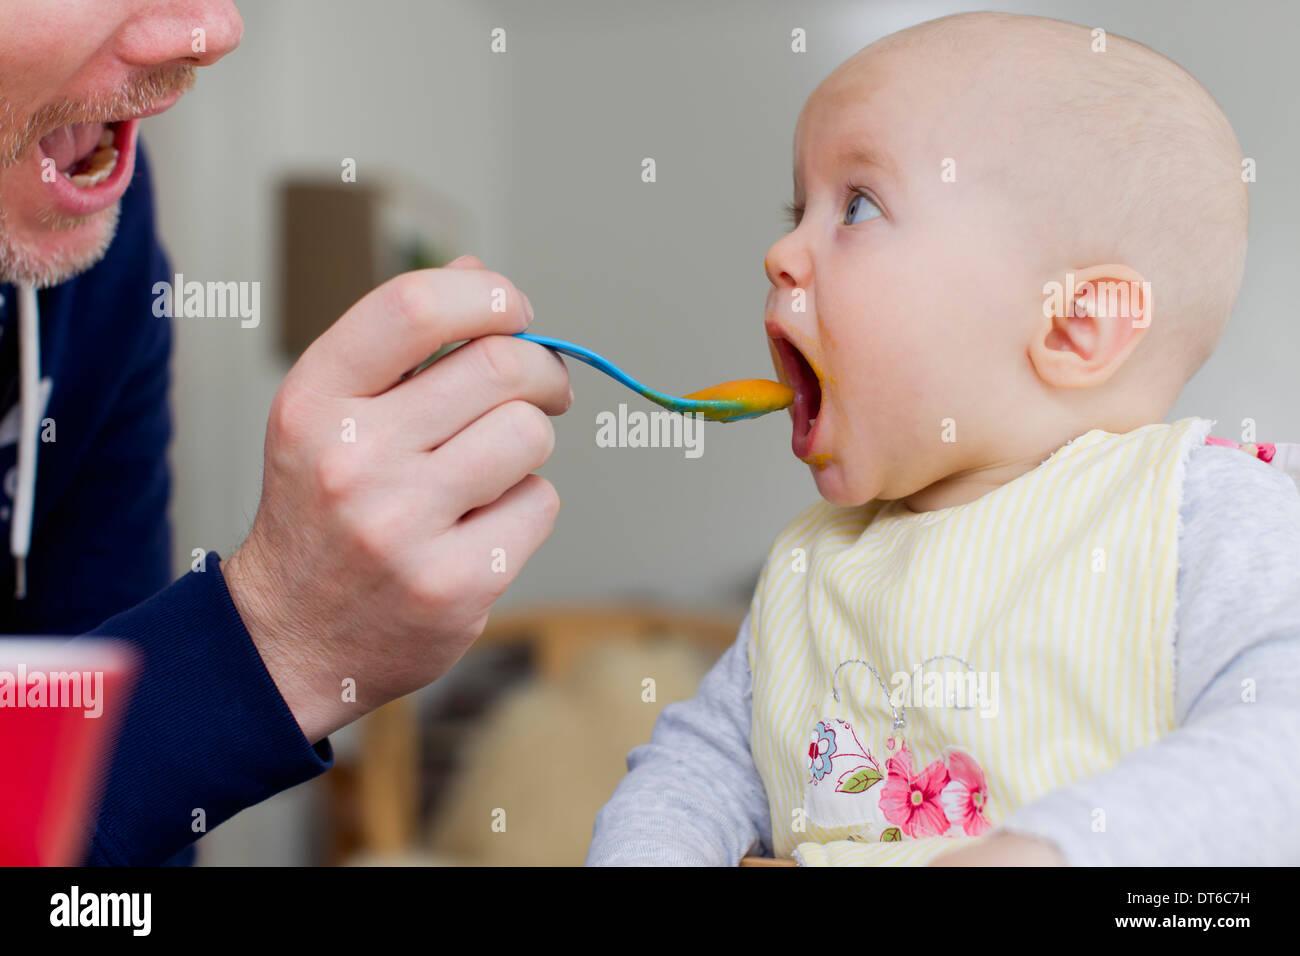 Vater Löffel füttern Babys Tochter Stockbild